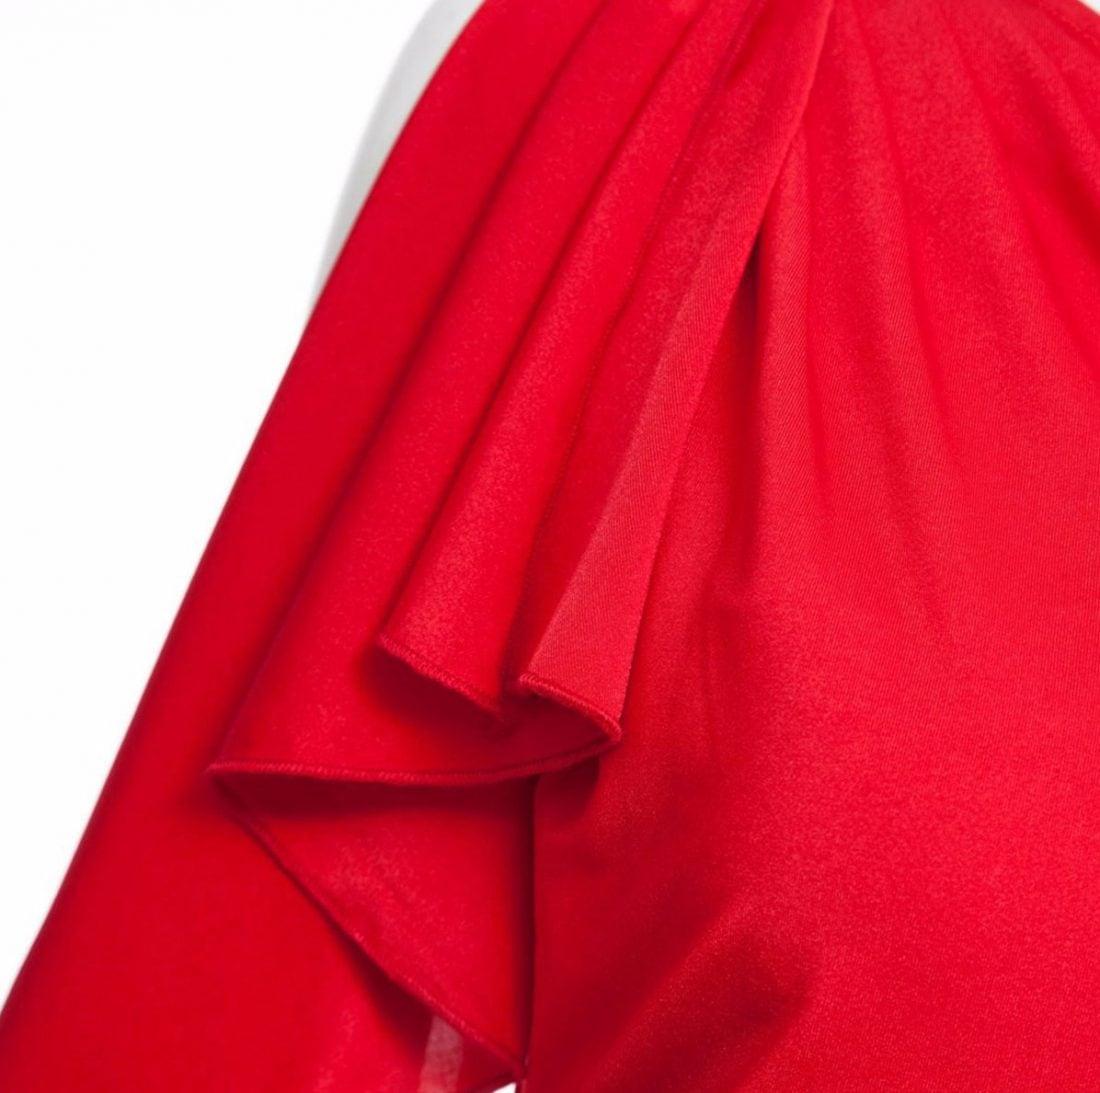 M0188 red8 Short Sleeve Dresses maureens.com boutique